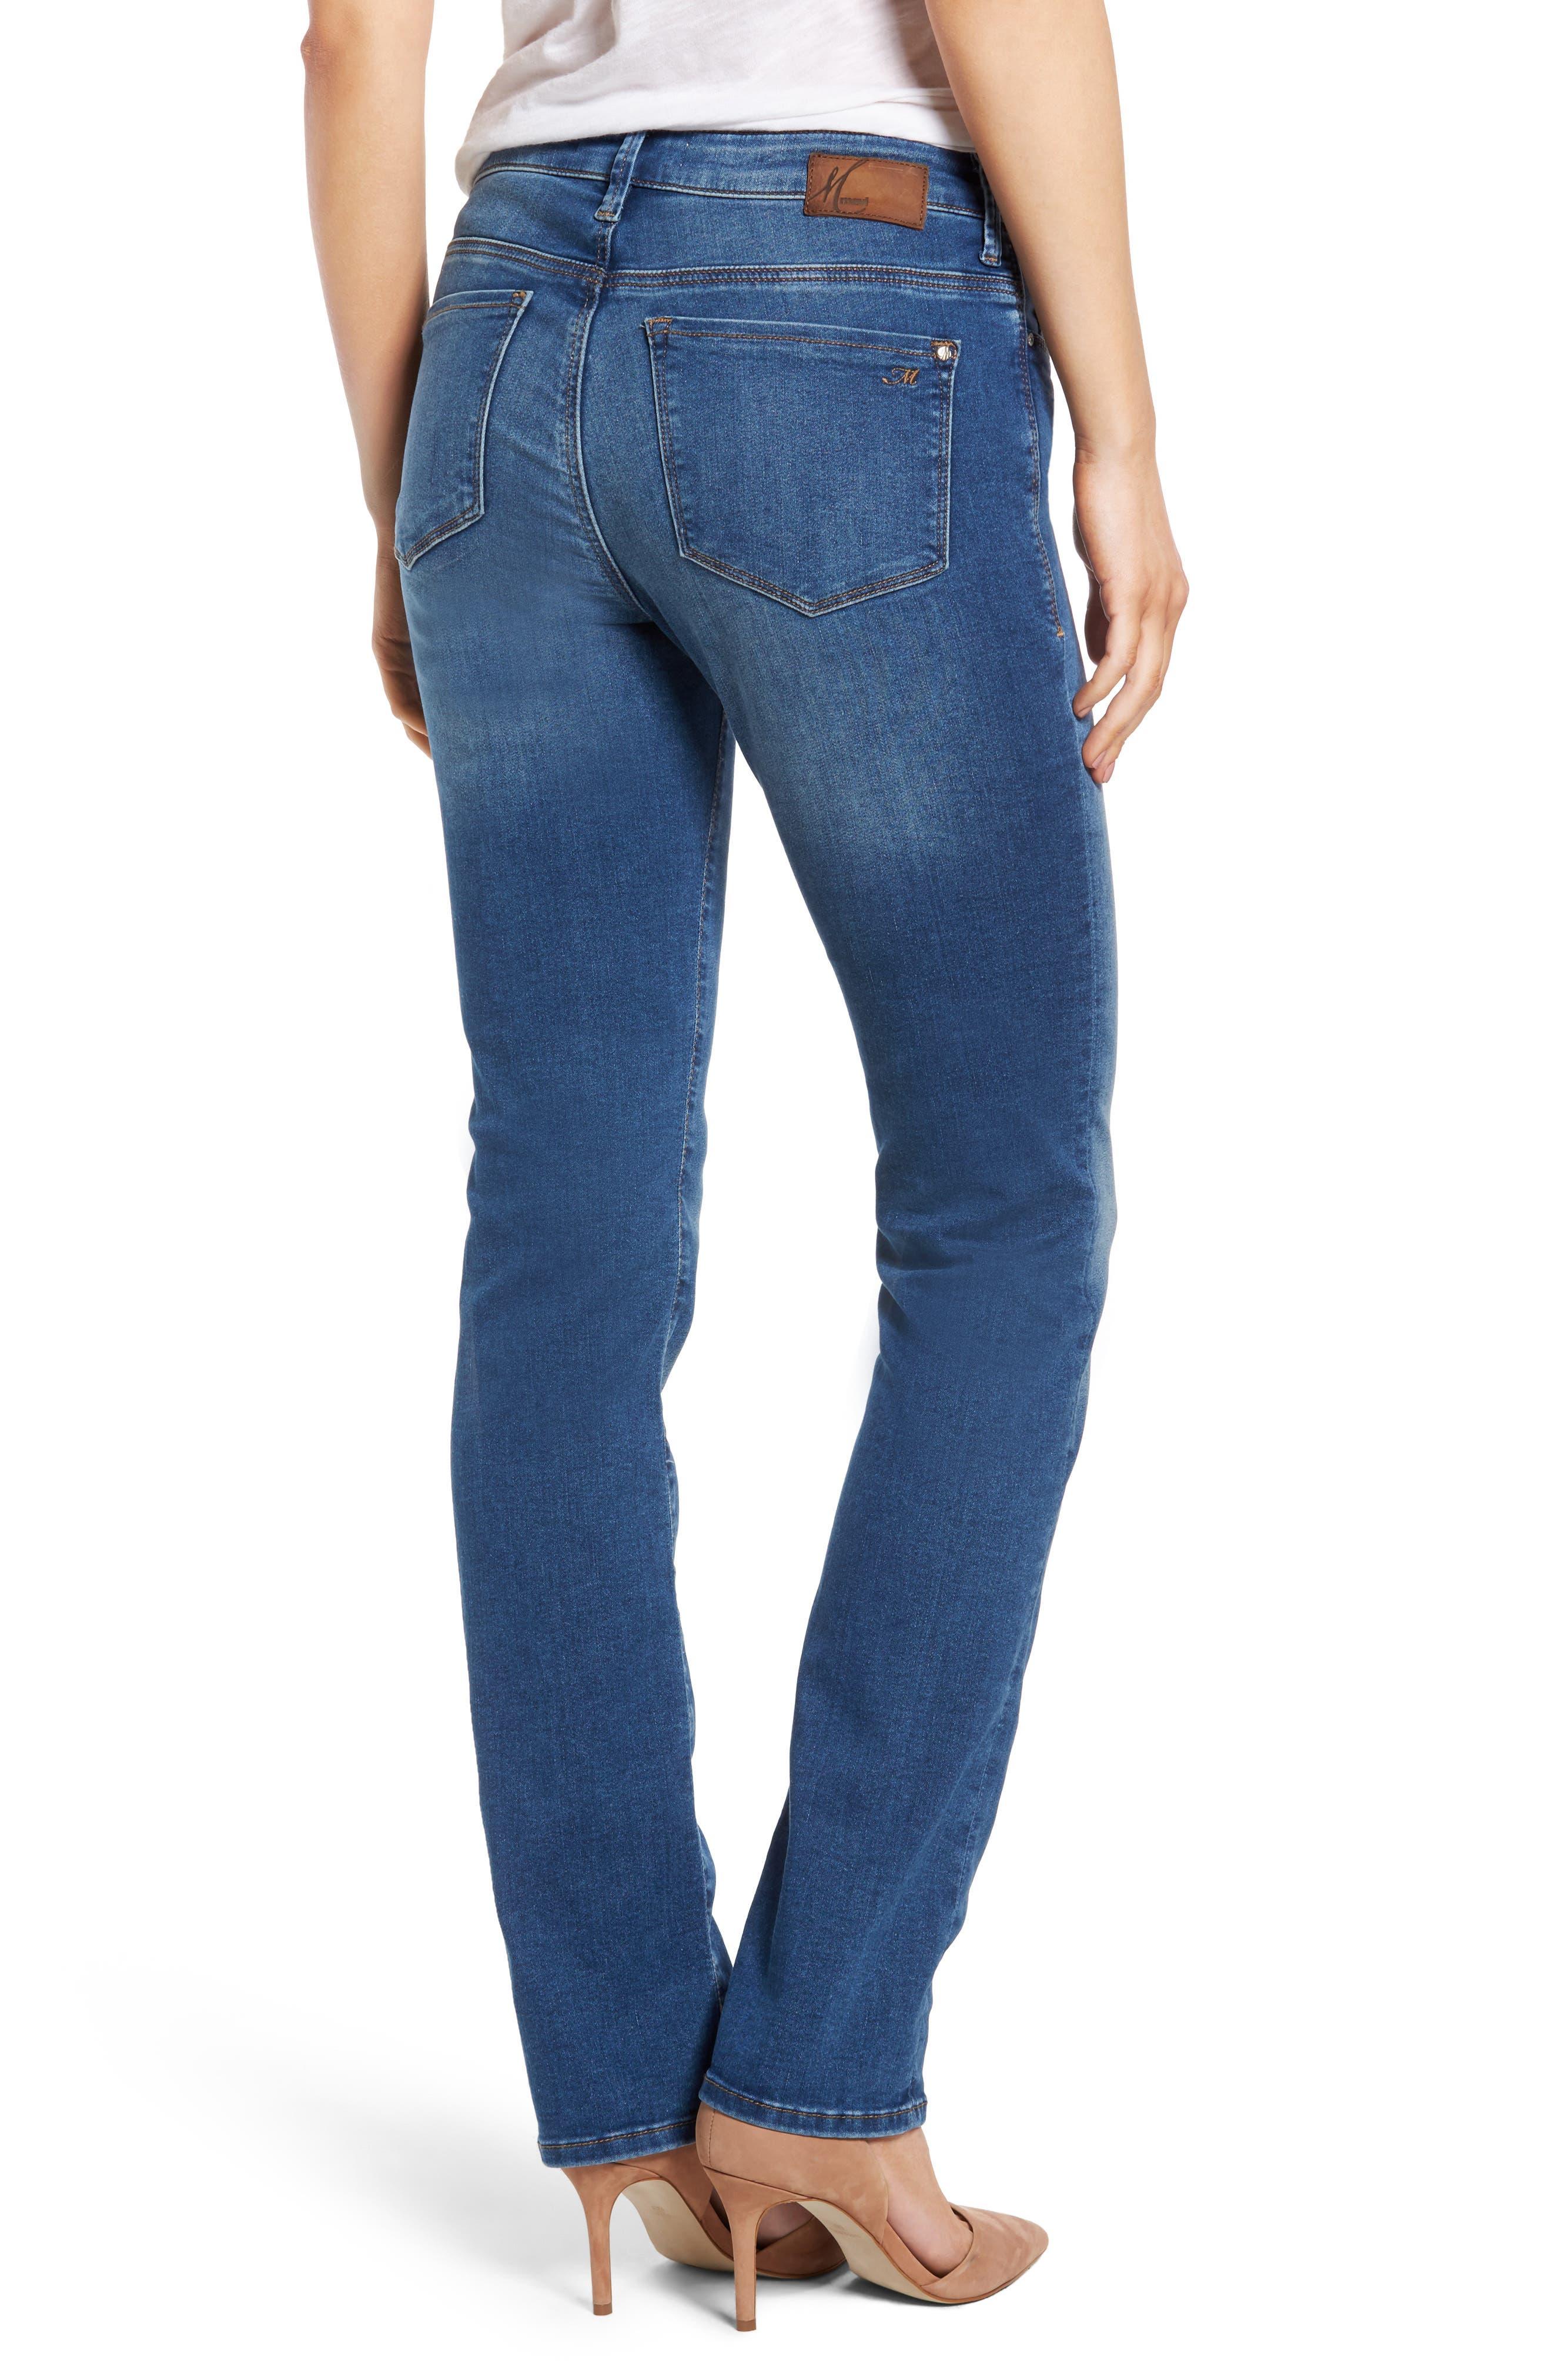 Kendra High Waist Stretch Denim Jeans,                             Alternate thumbnail 2, color,                             650